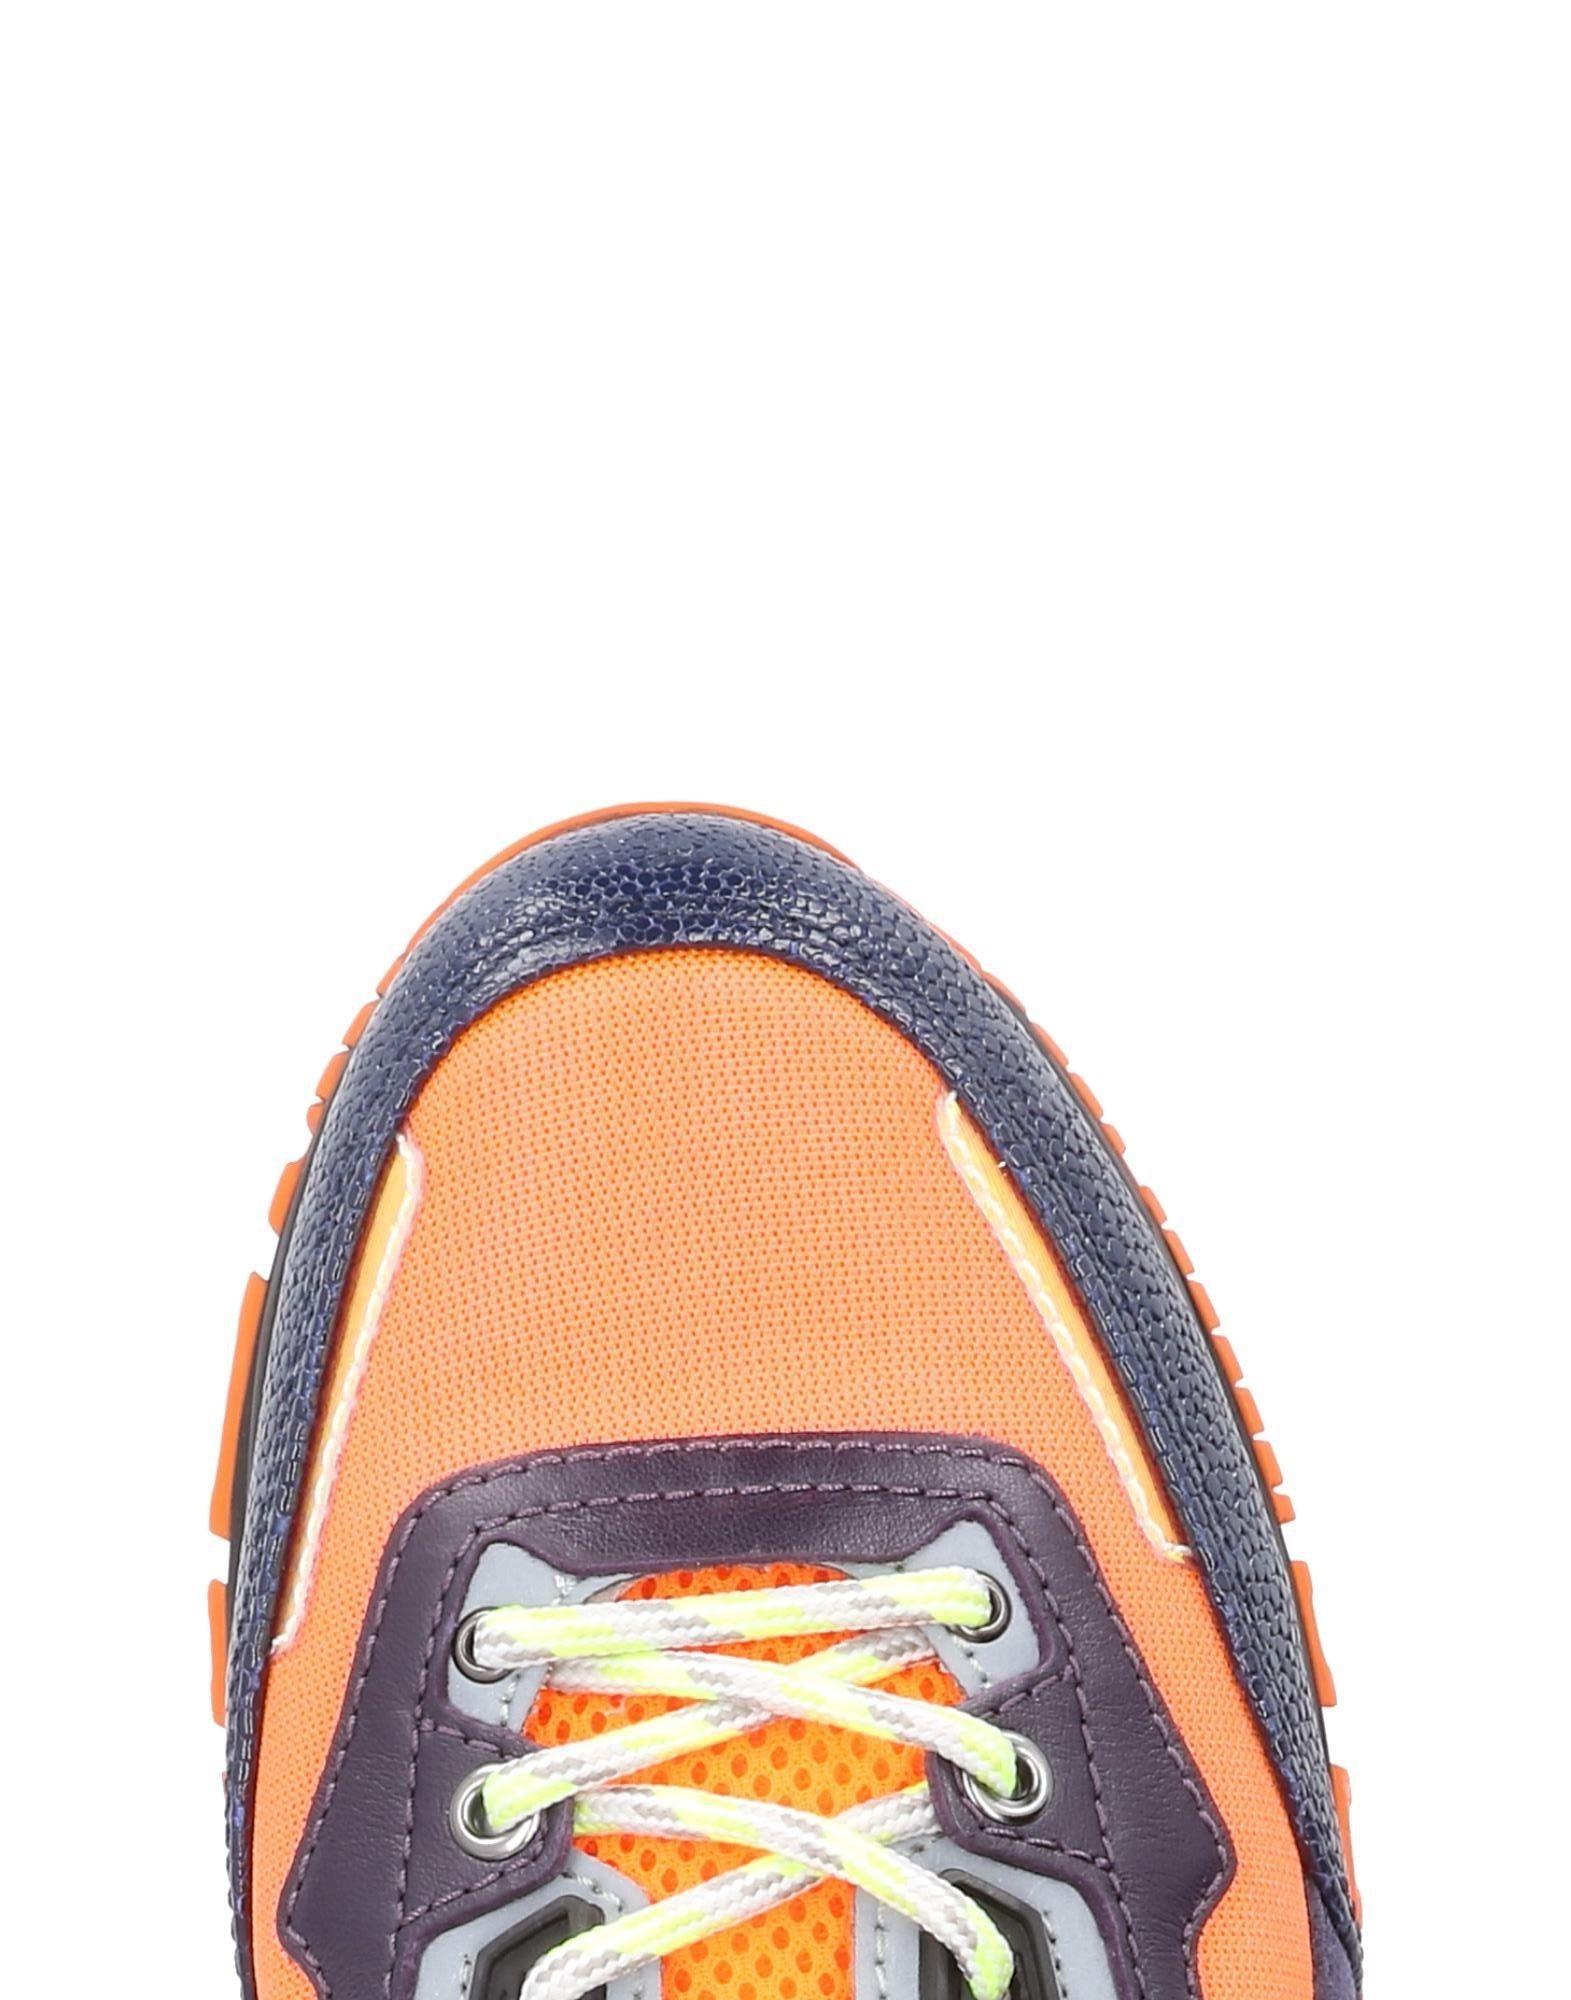 Lanvin Sneakers Qualität Herren  11459904GC Gute Qualität Sneakers beliebte Schuhe b9ebfb